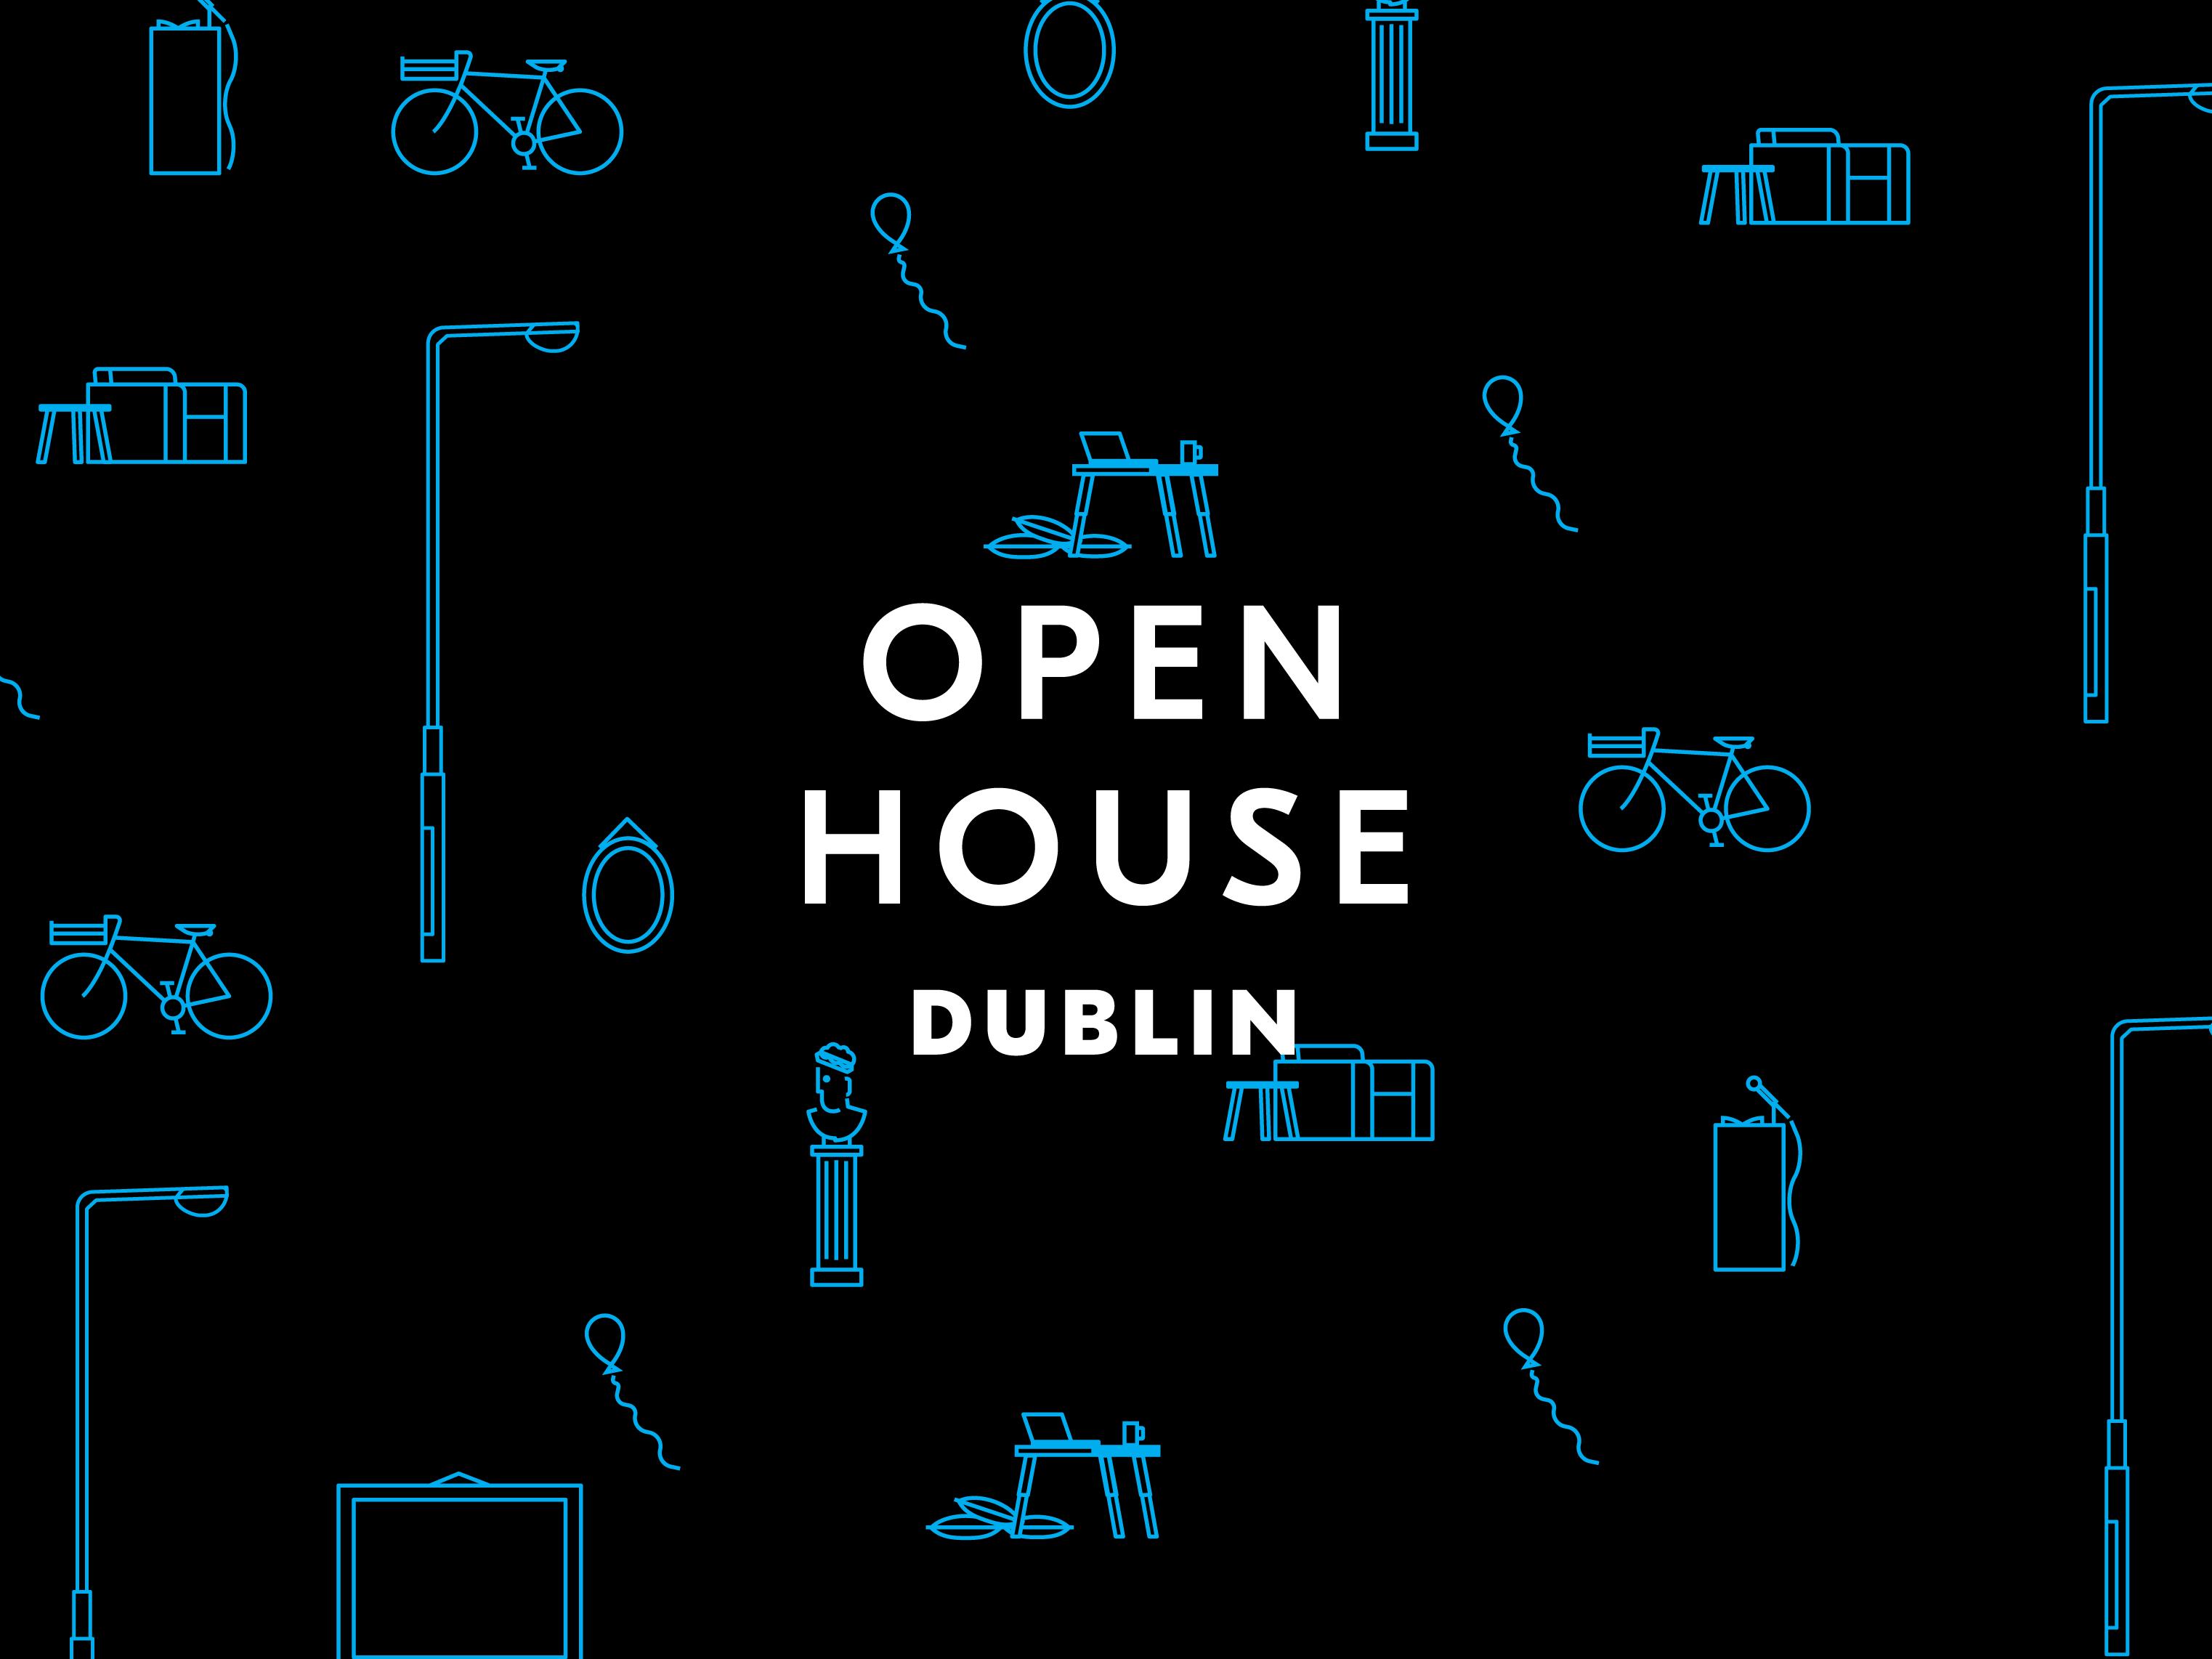 Cover image: Open House Dublin 2016